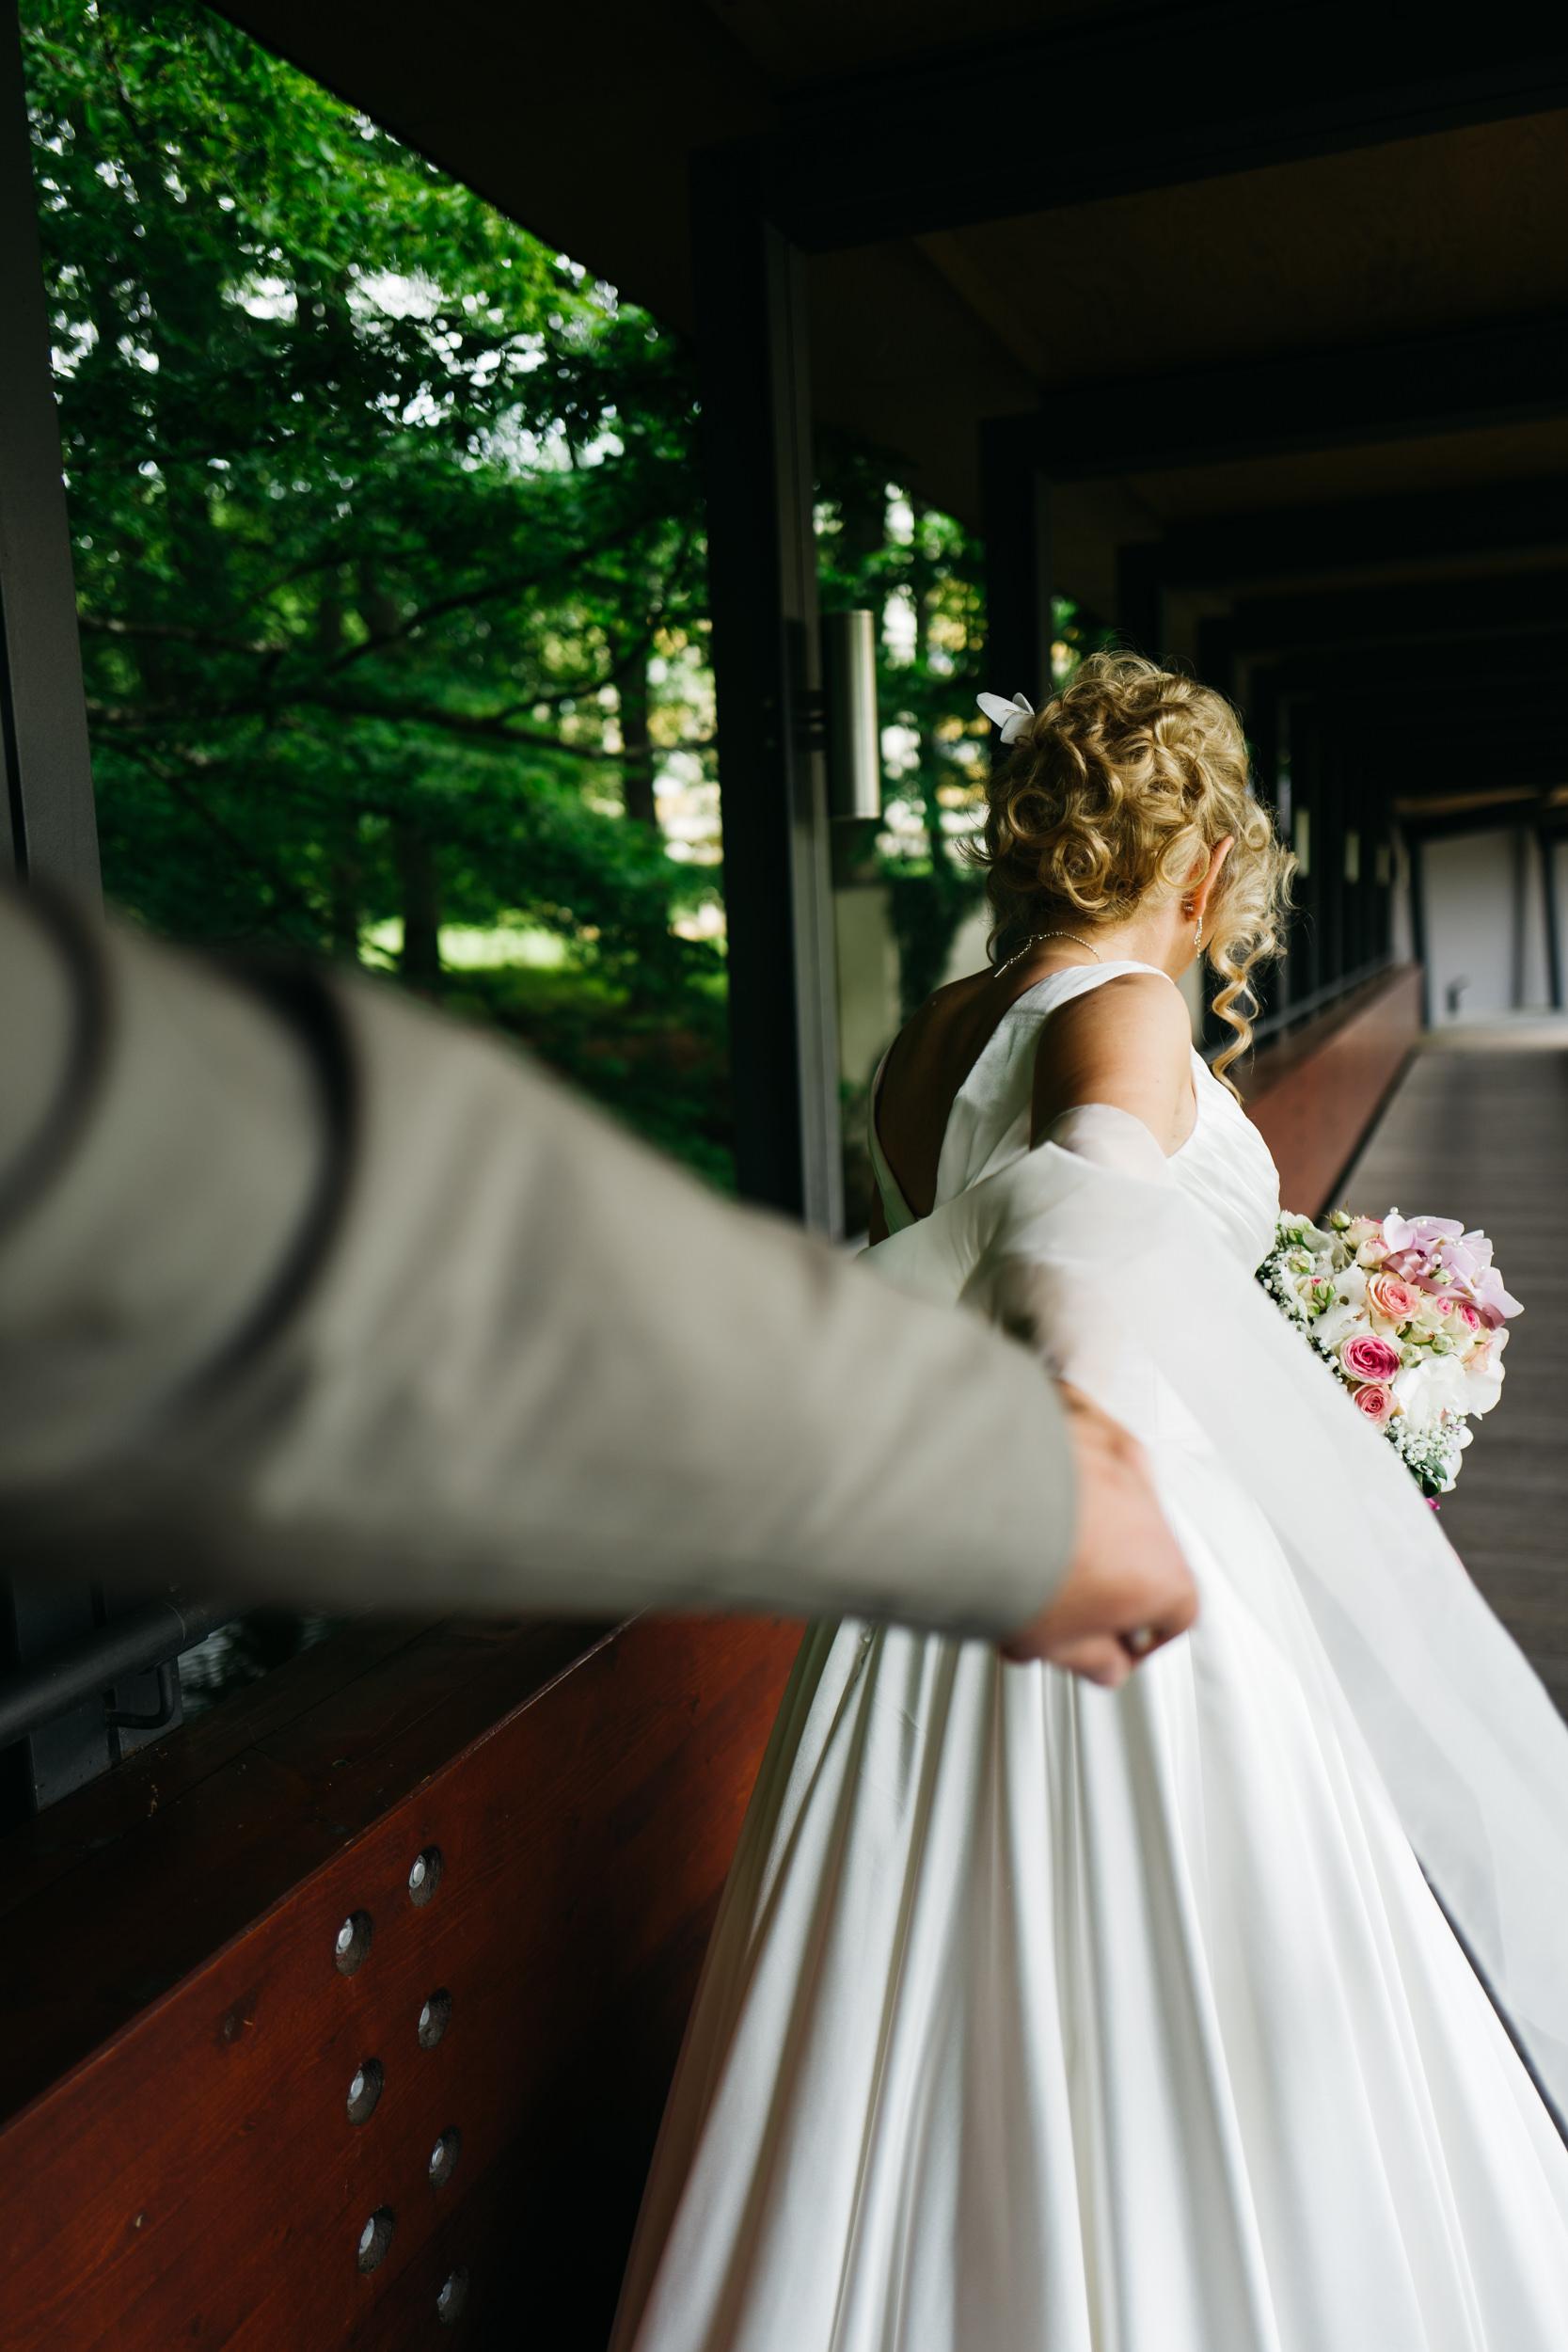 20150612 - MLDS Wedding-173.jpg